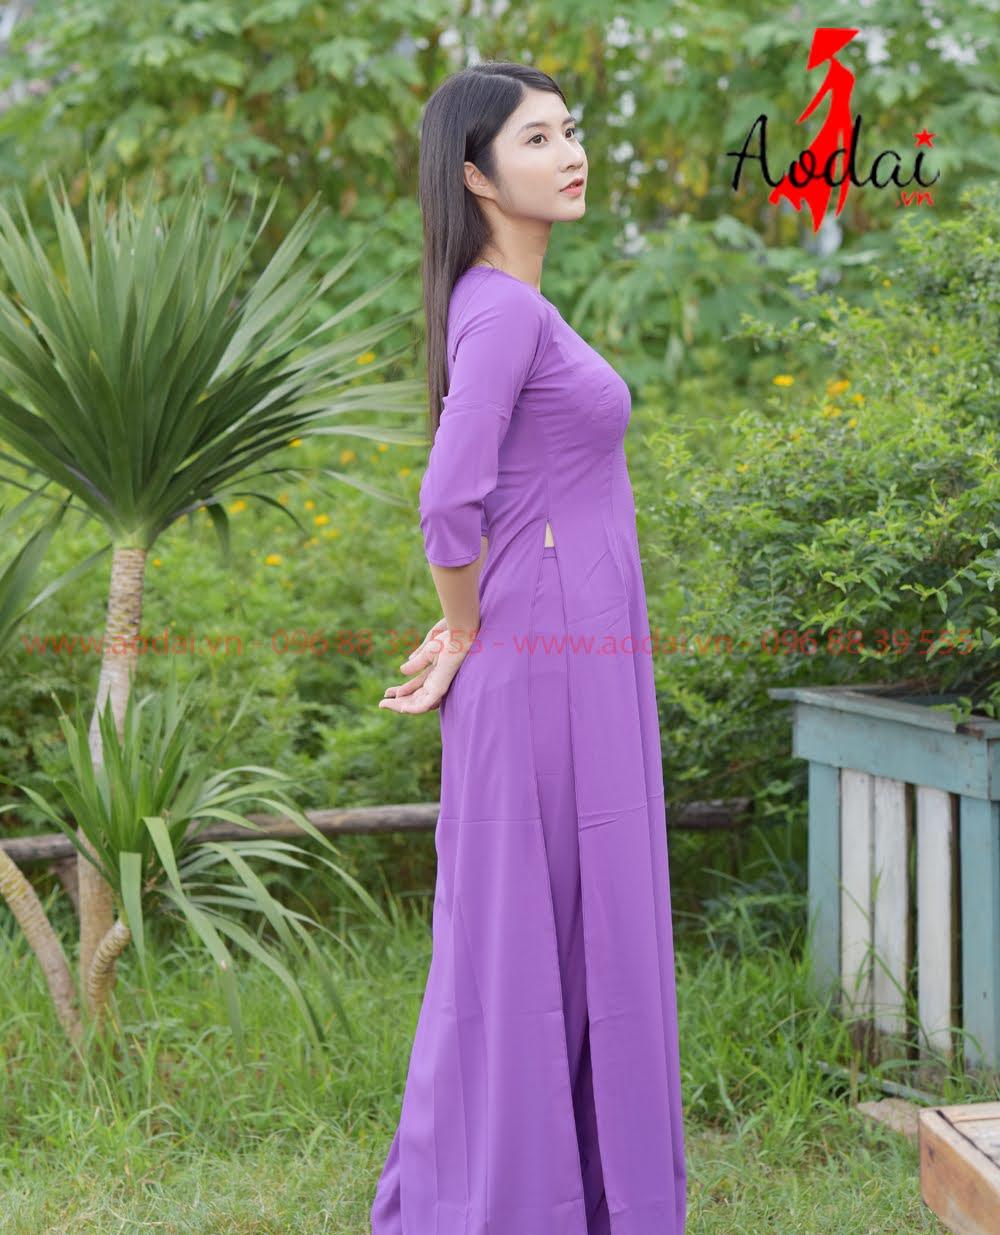 In áo dài tại Thanh Oai